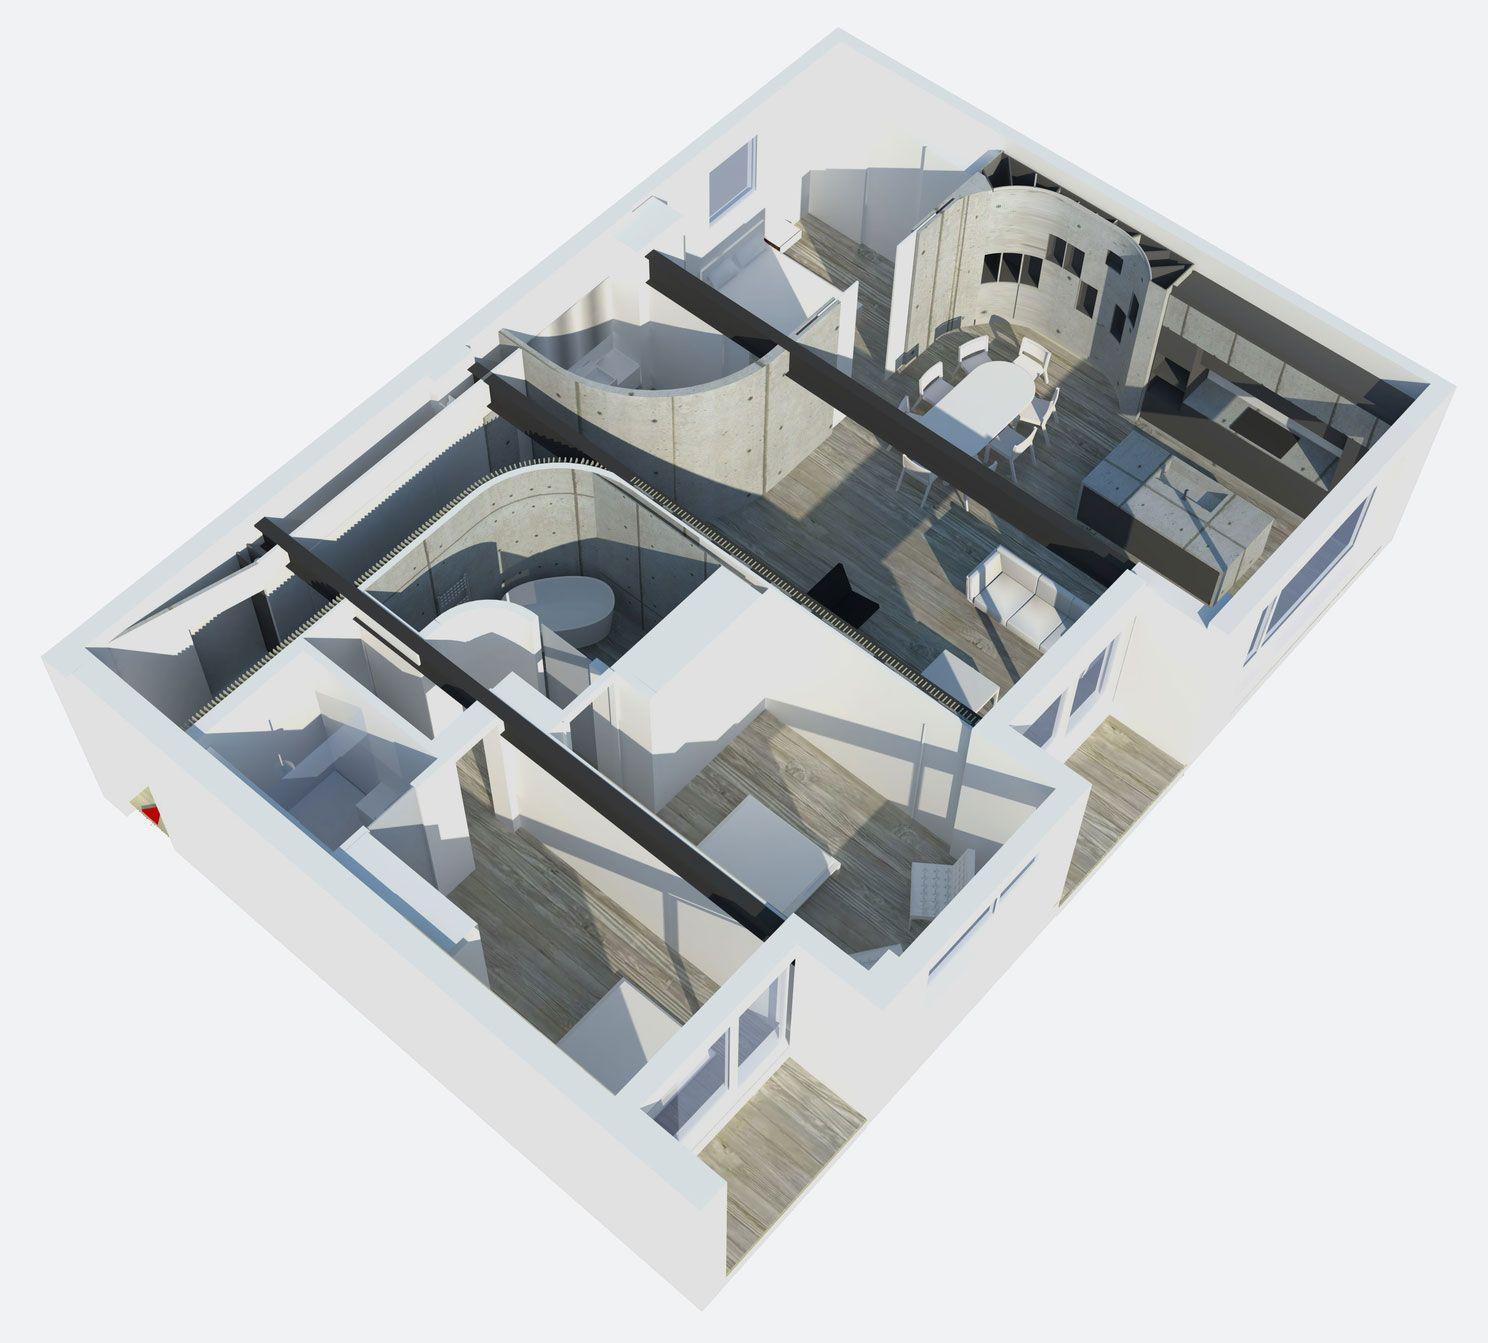 Redchurch Loft by Studio Verve Architects (15)  Loft (isomatic perspective)